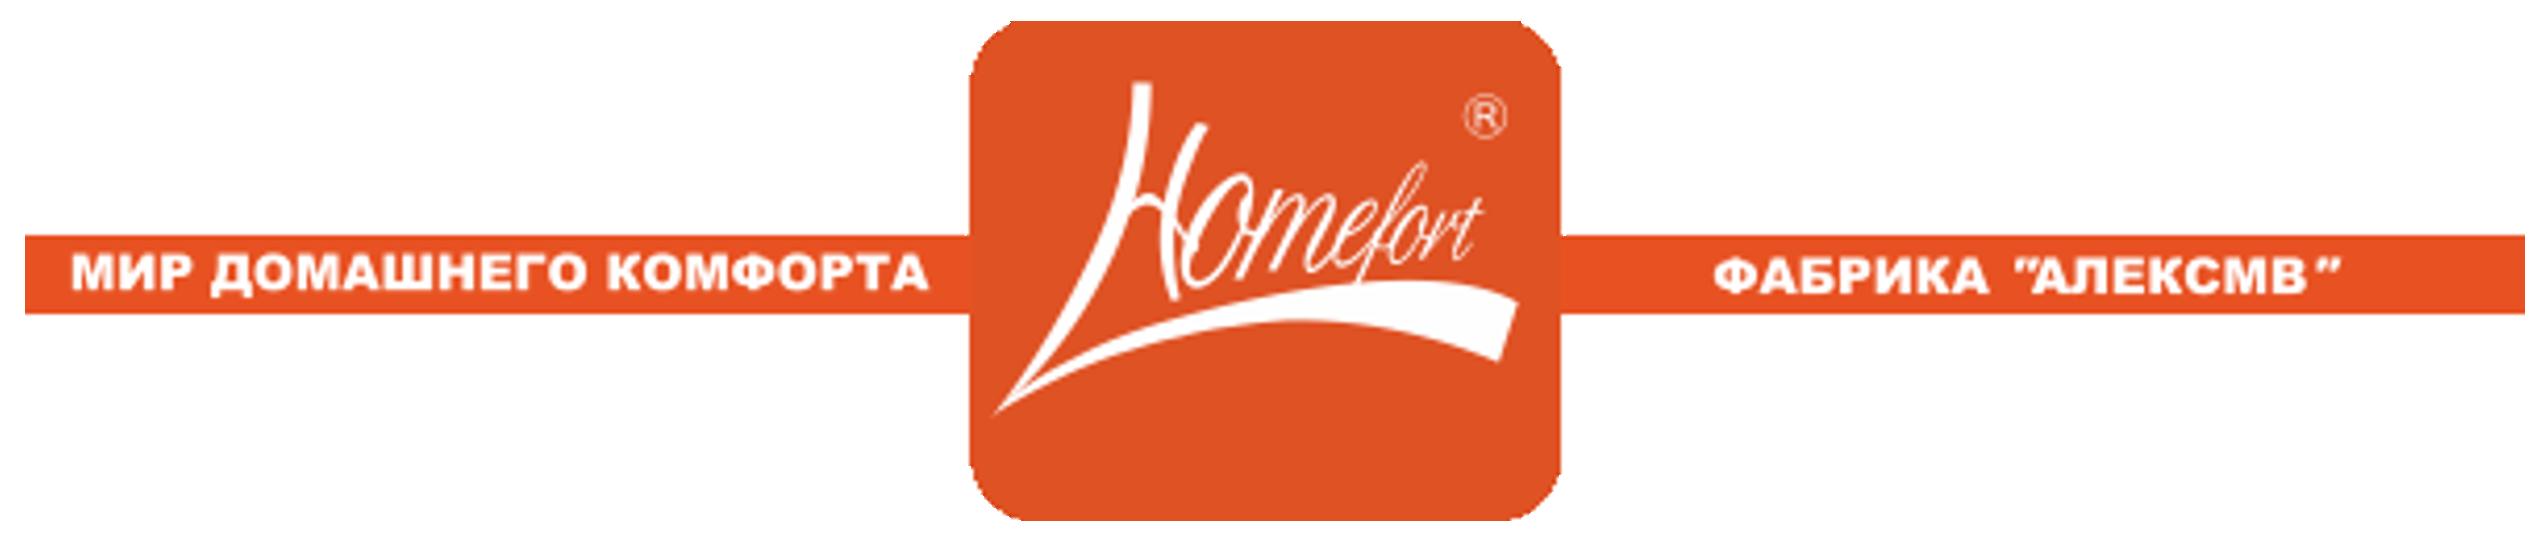 Склад домашнього текстилю став представником Homefort, фото-1